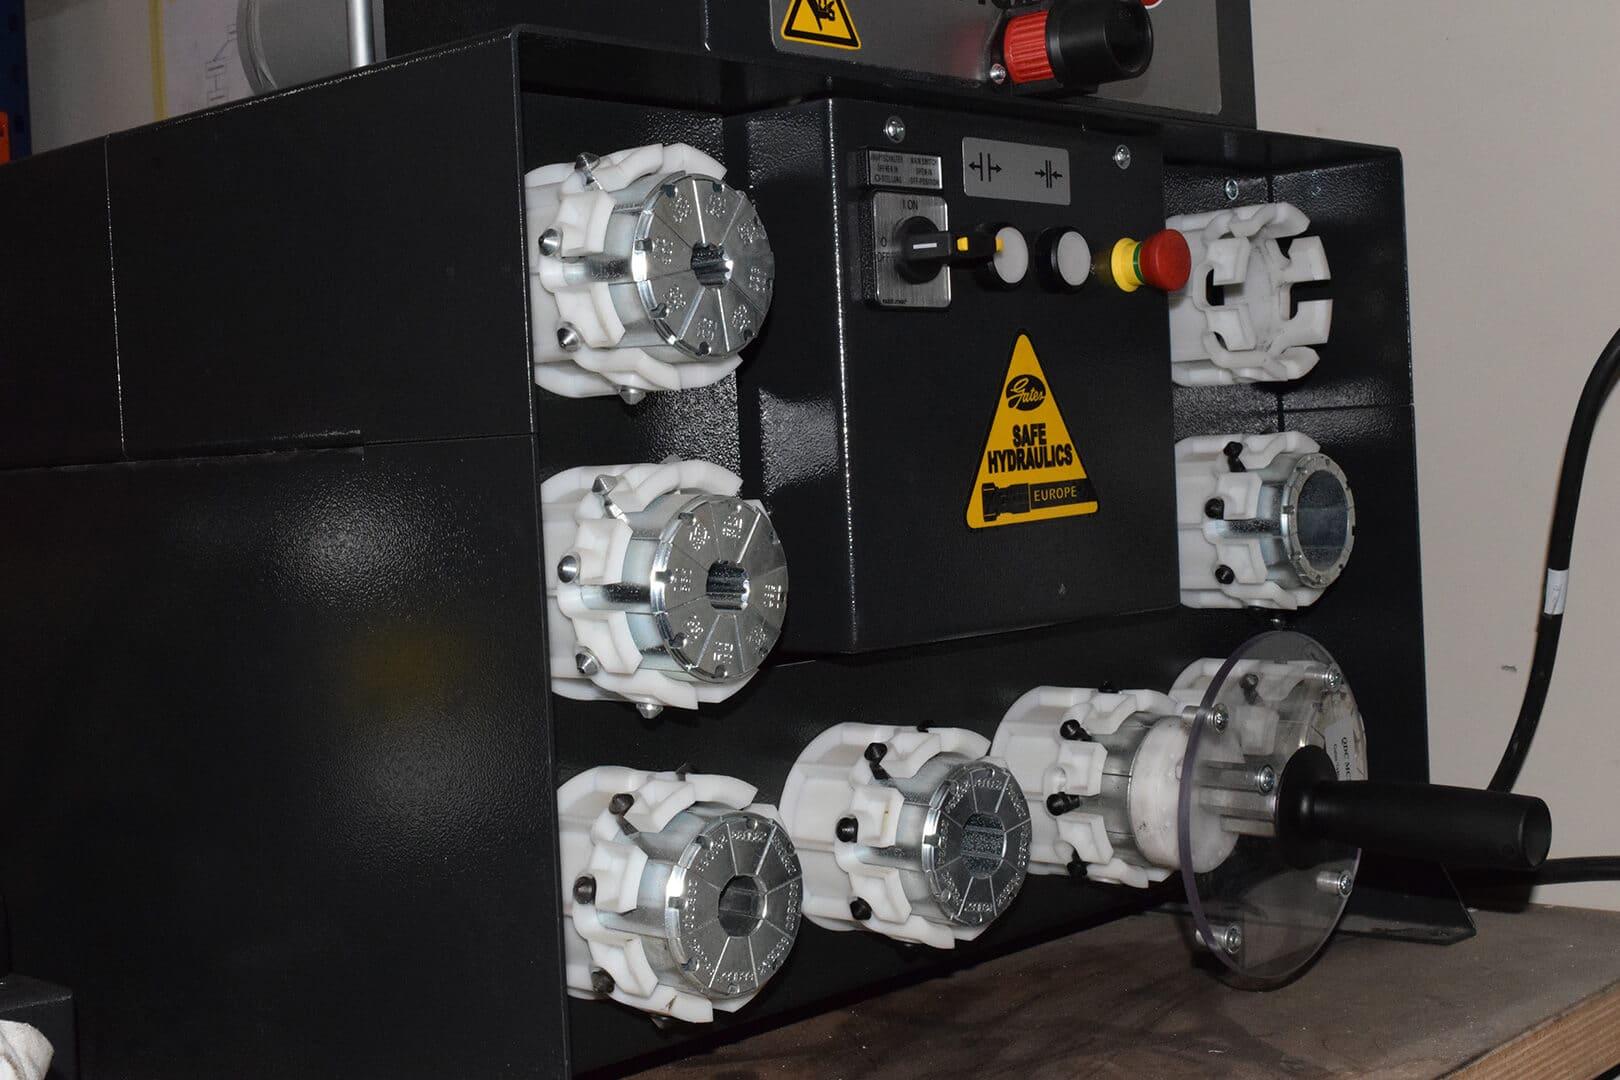 DSC 0016 - Flexibles Hydrauliques